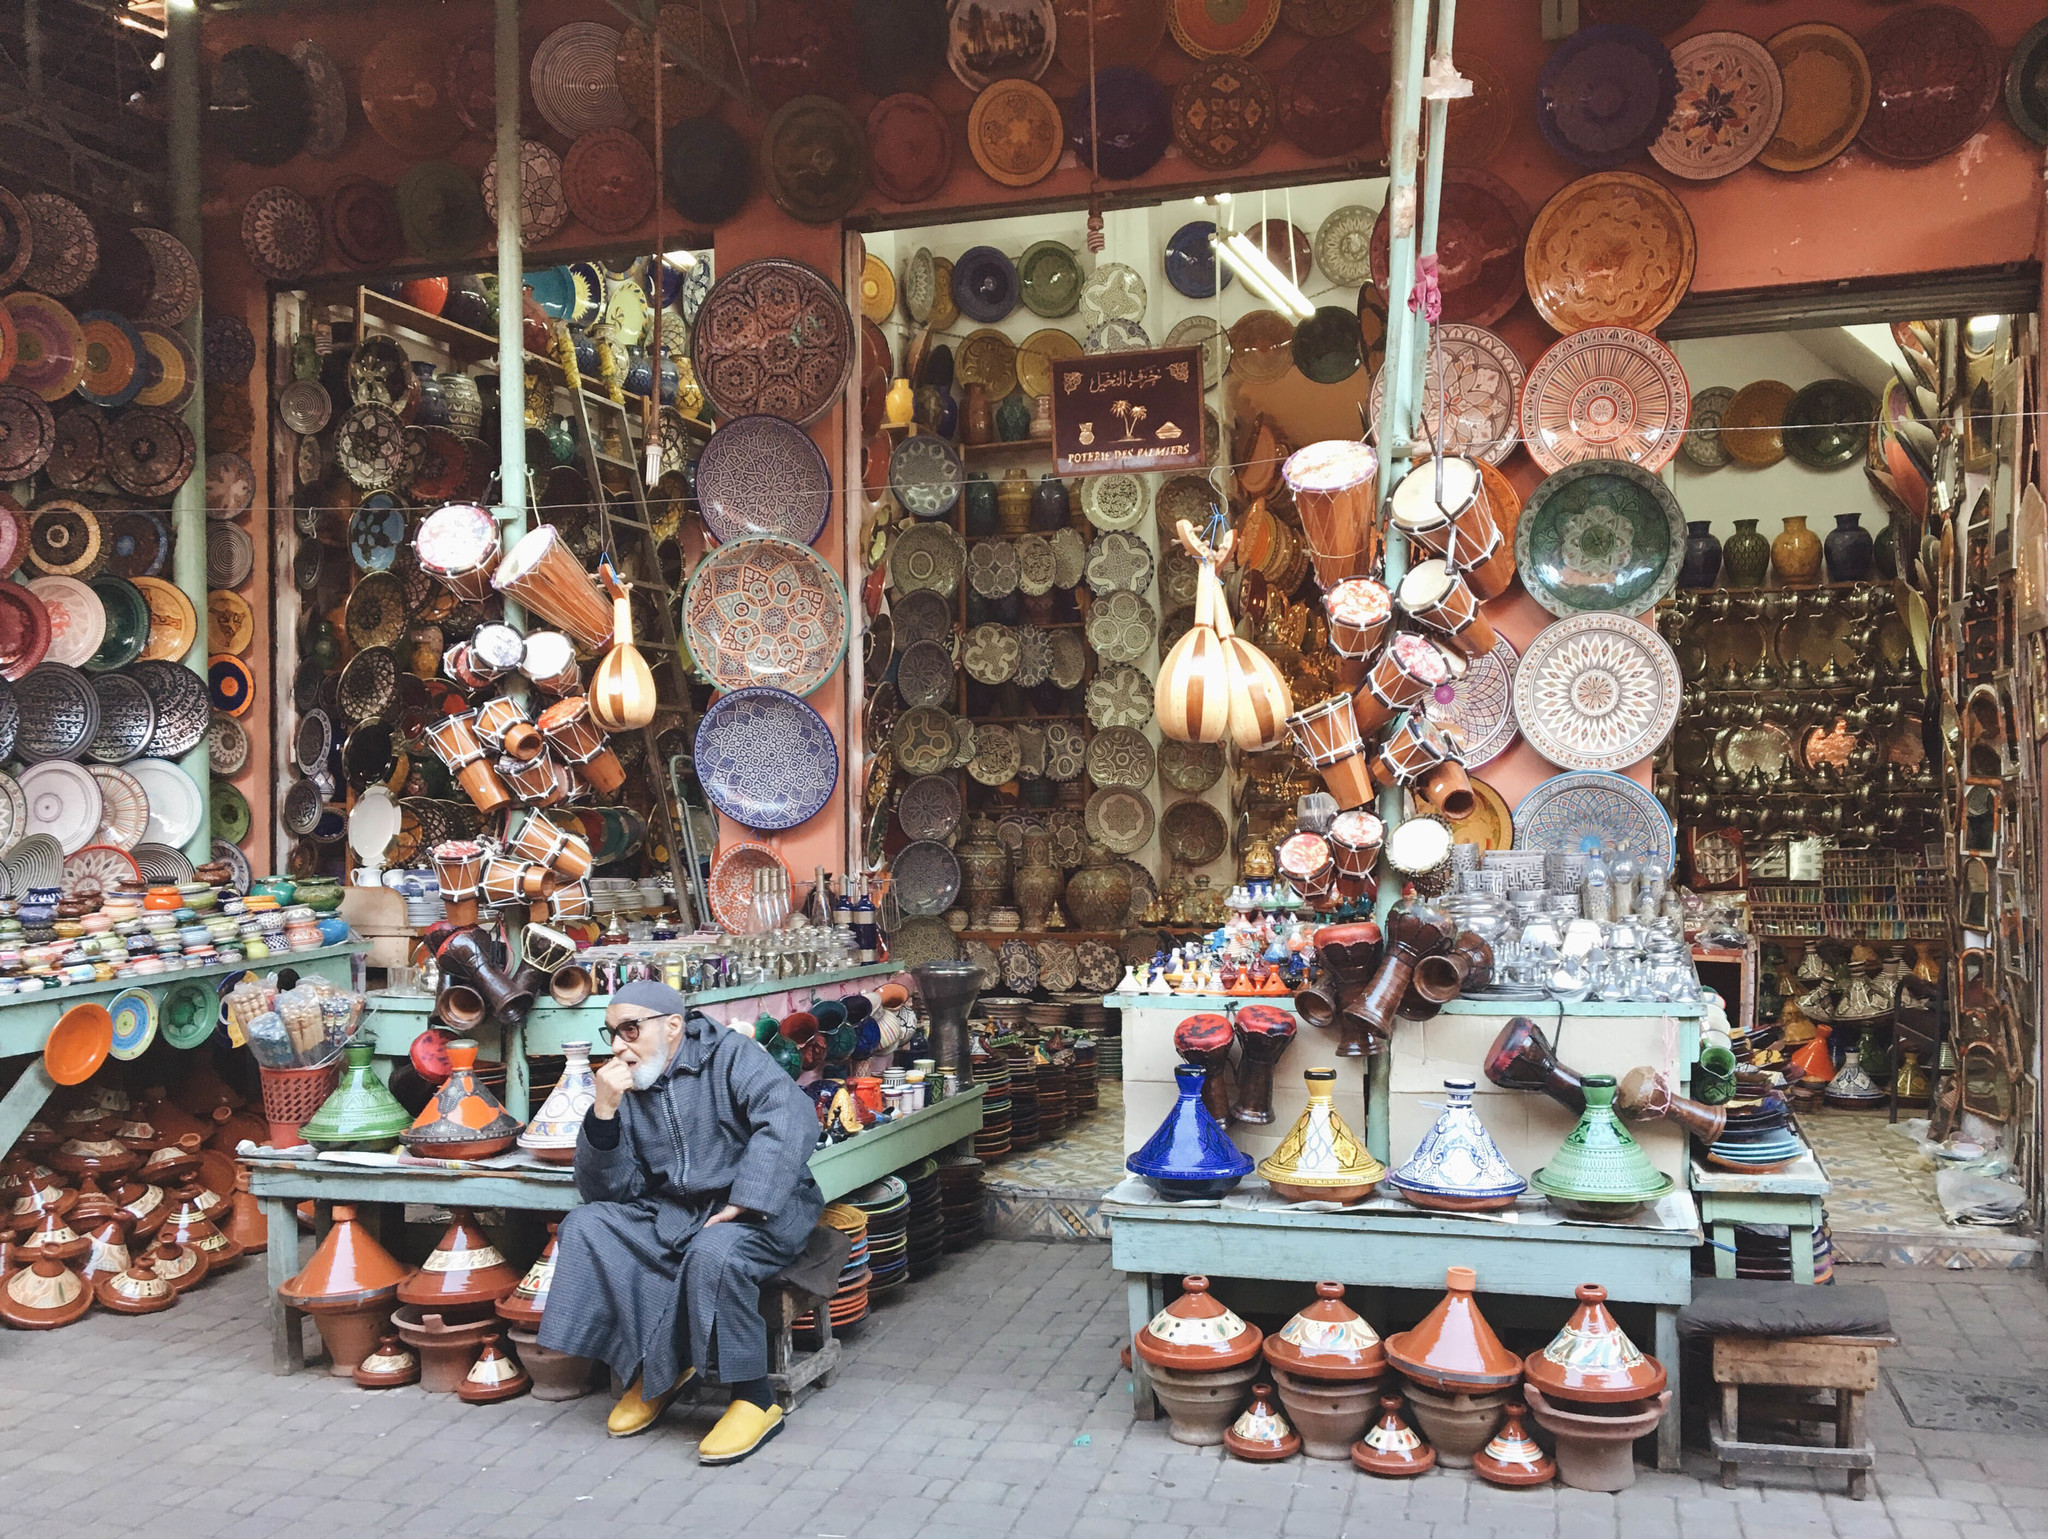 Cerámica Marruecos.